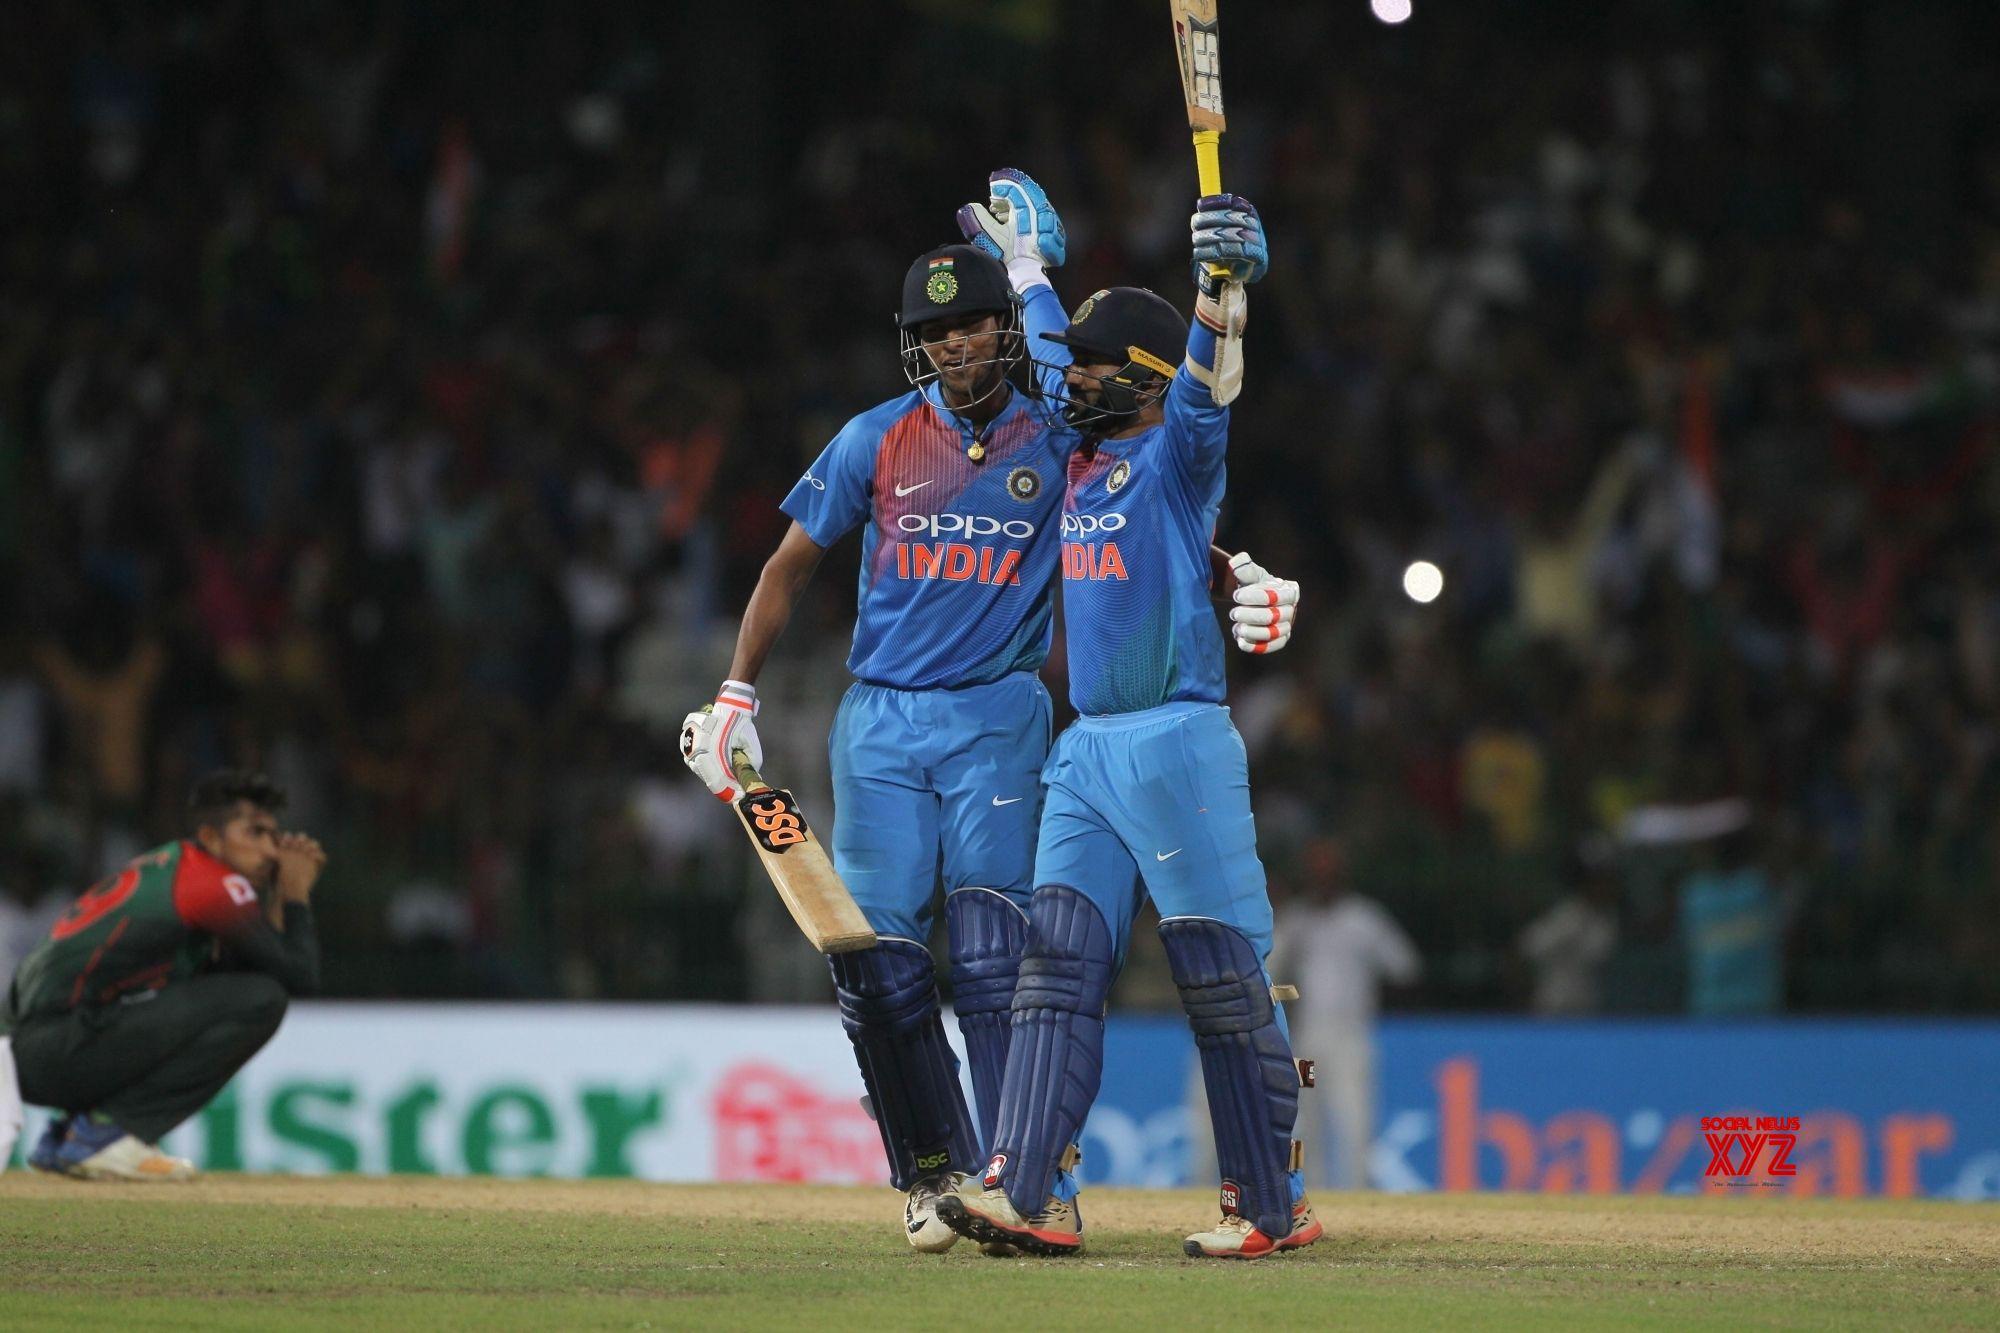 Colombo: Dinesh Karthik and Washington Sundar celebrate after winning 2018 Nidahas Twenty20 Tri-Series at R.Premadasa Stadium in Colombo, Sri Lanka on March 18, 2018. (Photo: Surjeet Yadav/IANS)